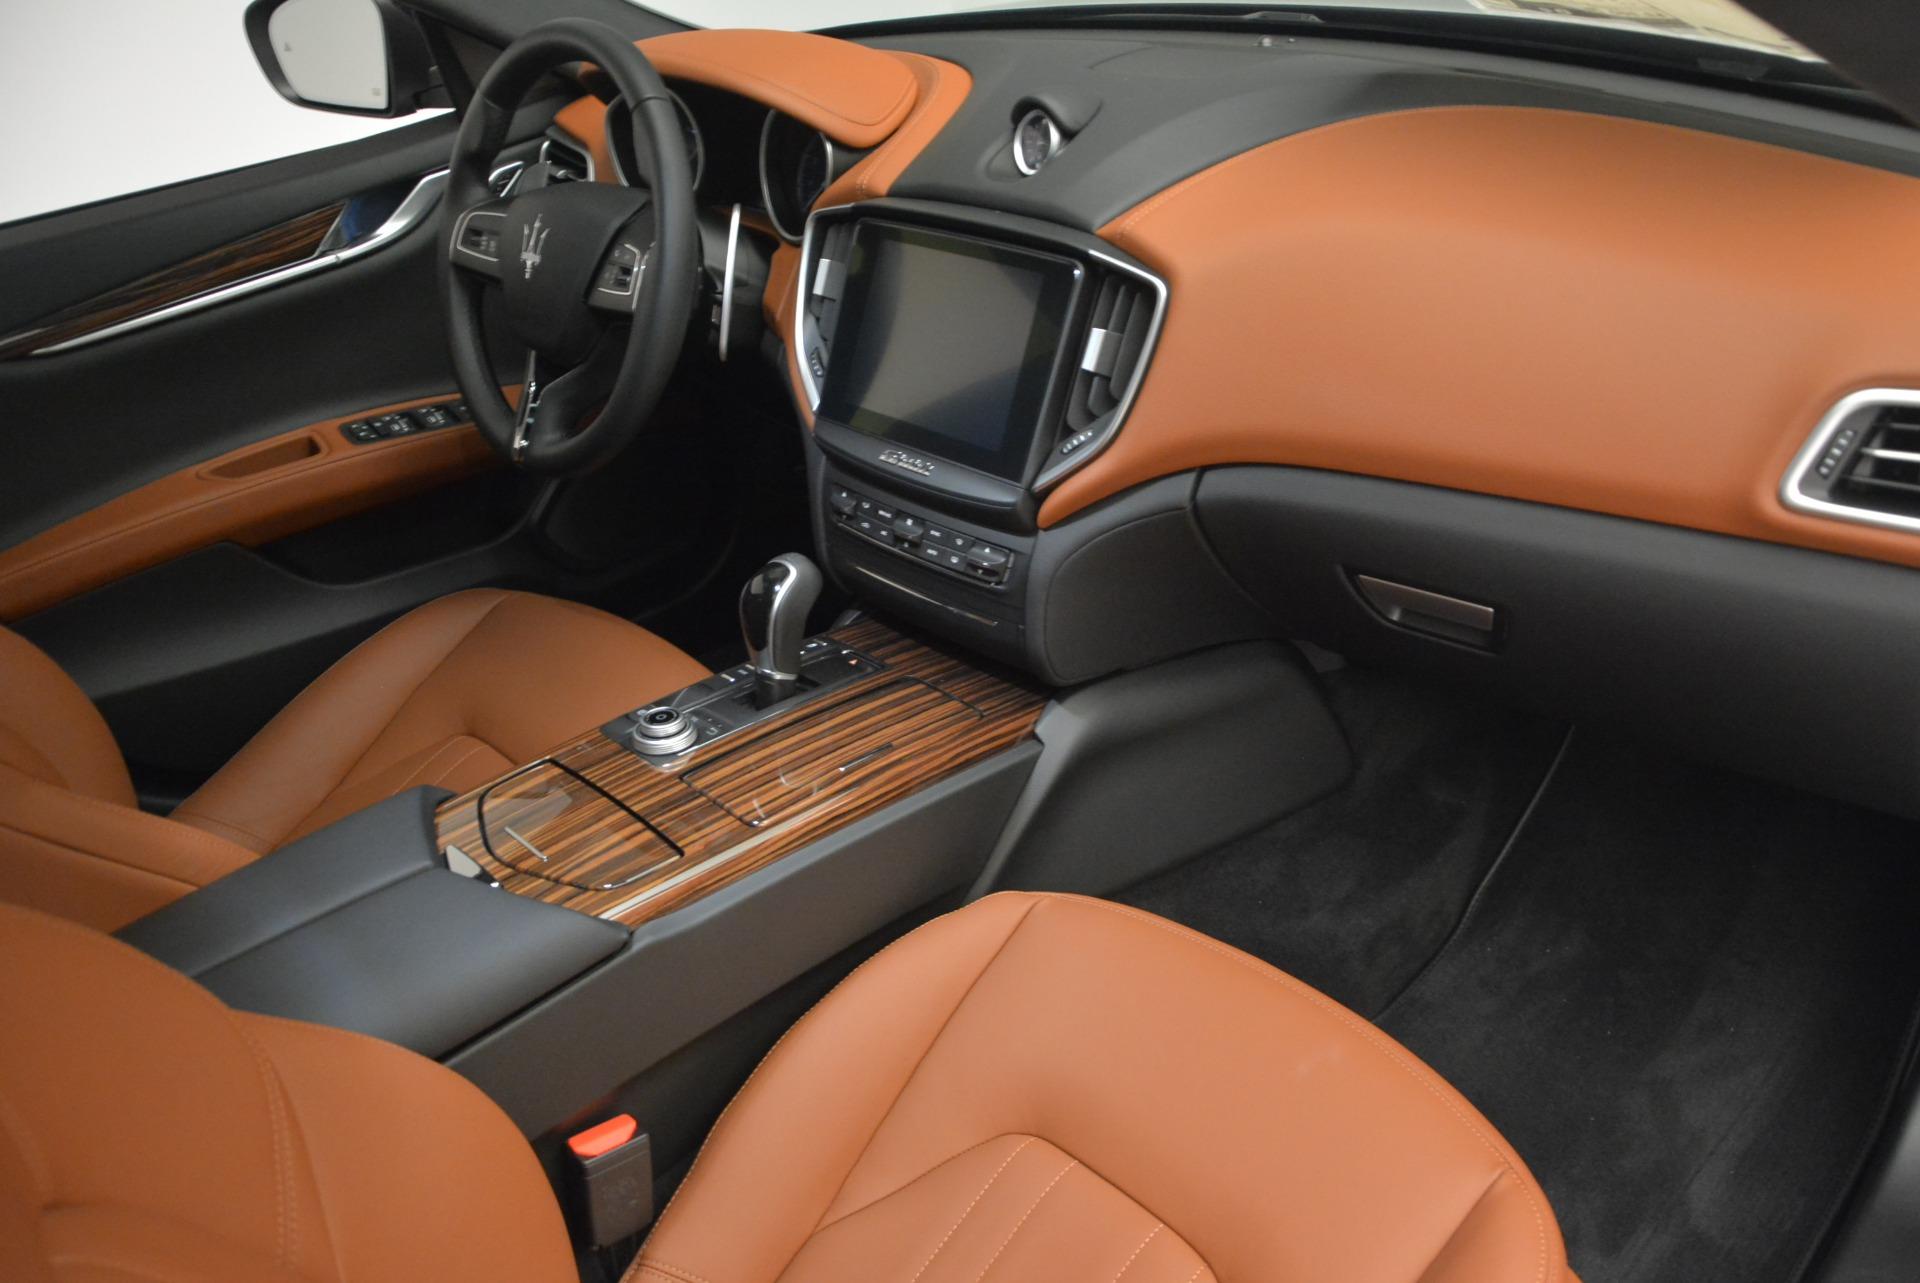 Used 2017 Maserati Ghibli S Q4 Ex-Loaner For Sale In Greenwich, CT 719_p20